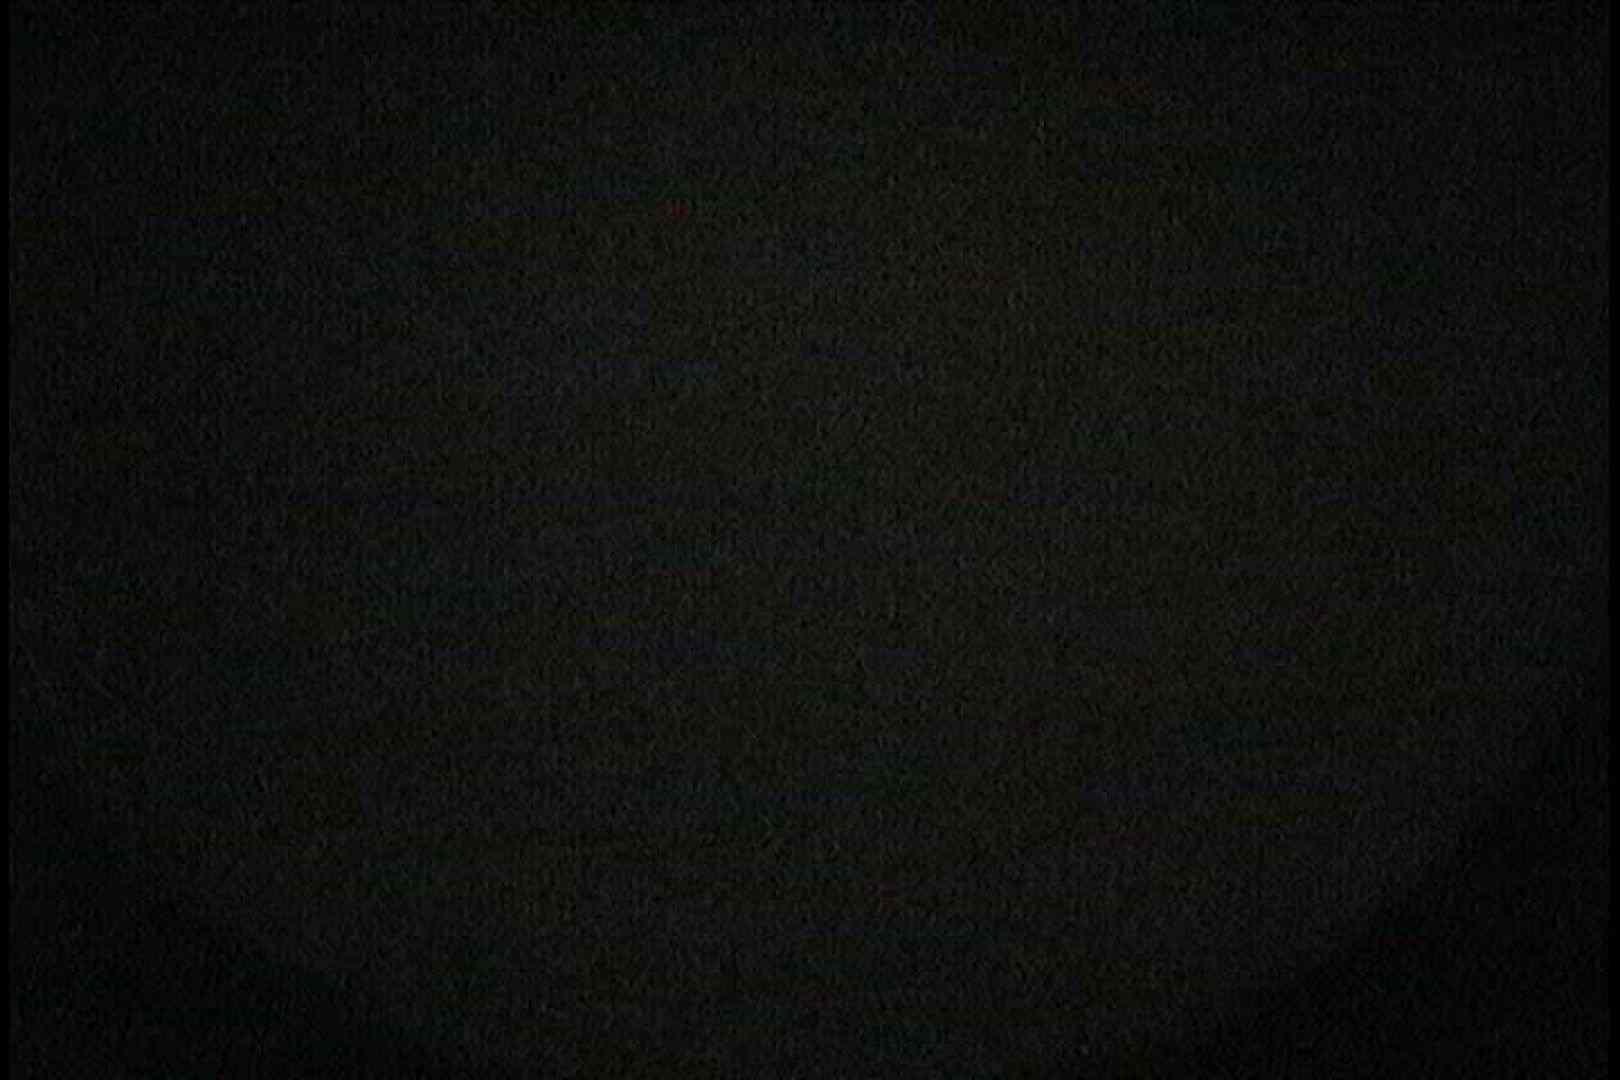 No.68 見事に可愛い巨乳ちゃん 室内暗いです むっちりガール すけべAV動画紹介 79枚 36